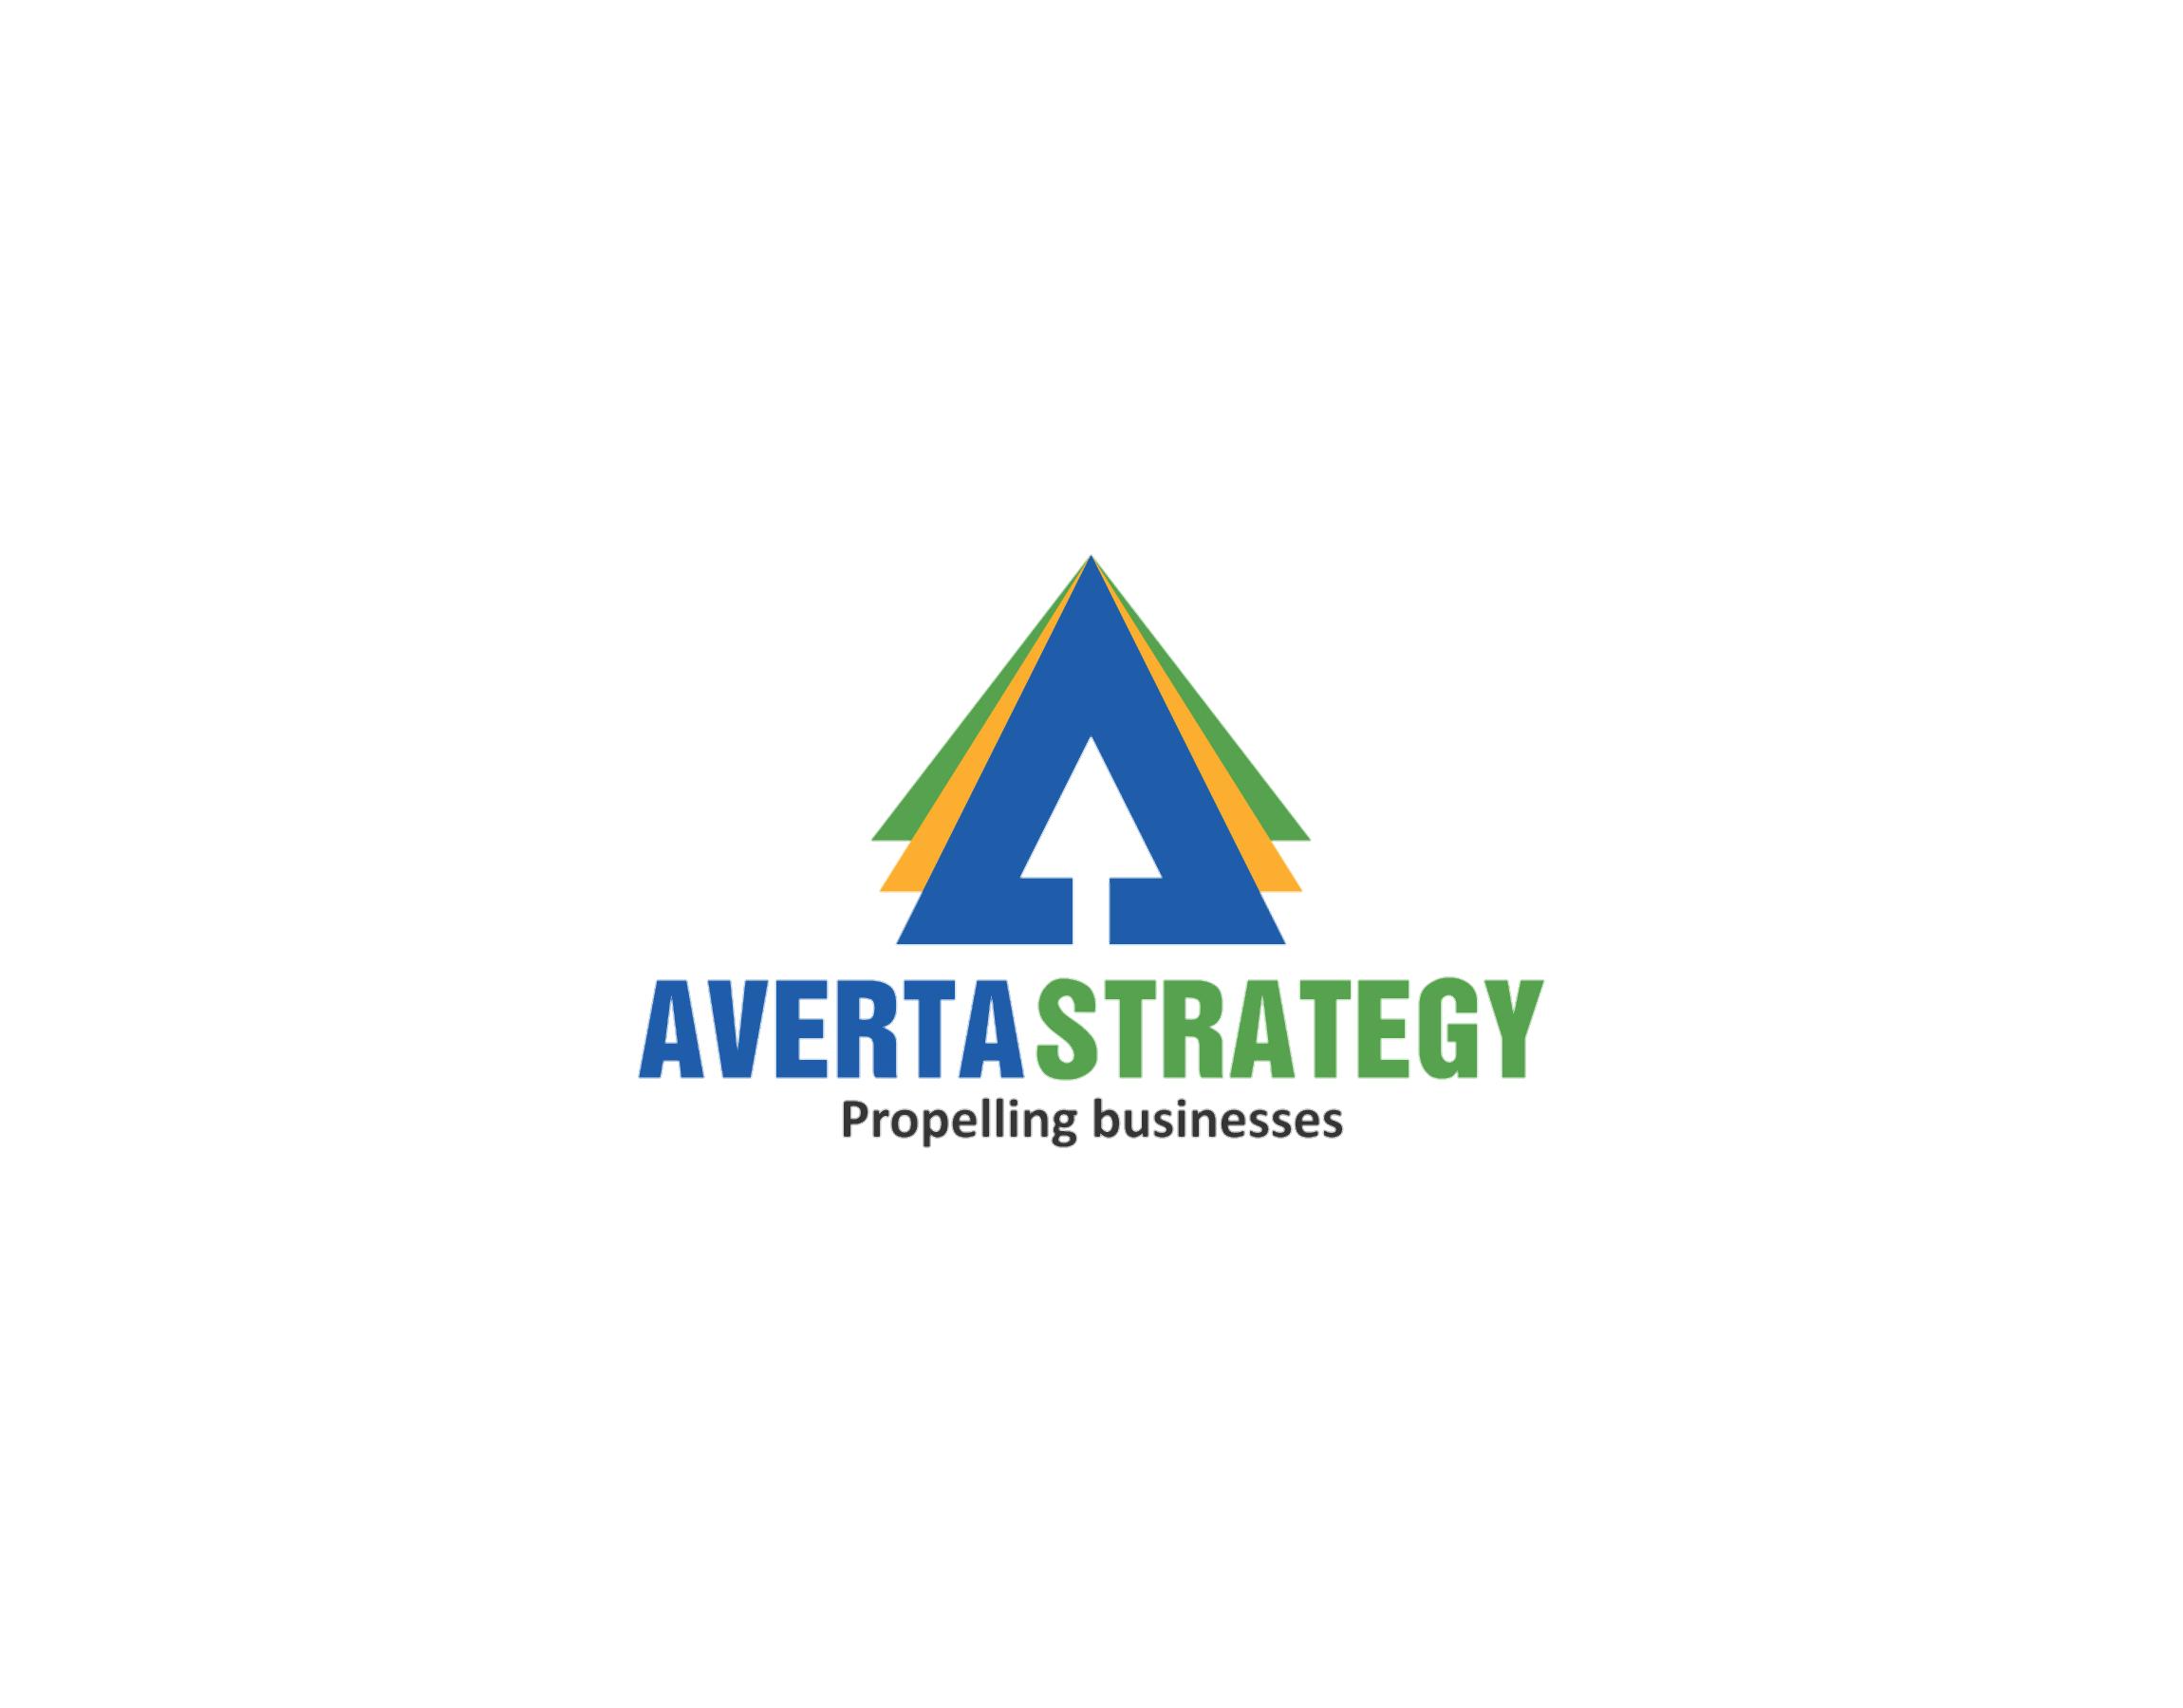 Averta strategy pvt ltd.